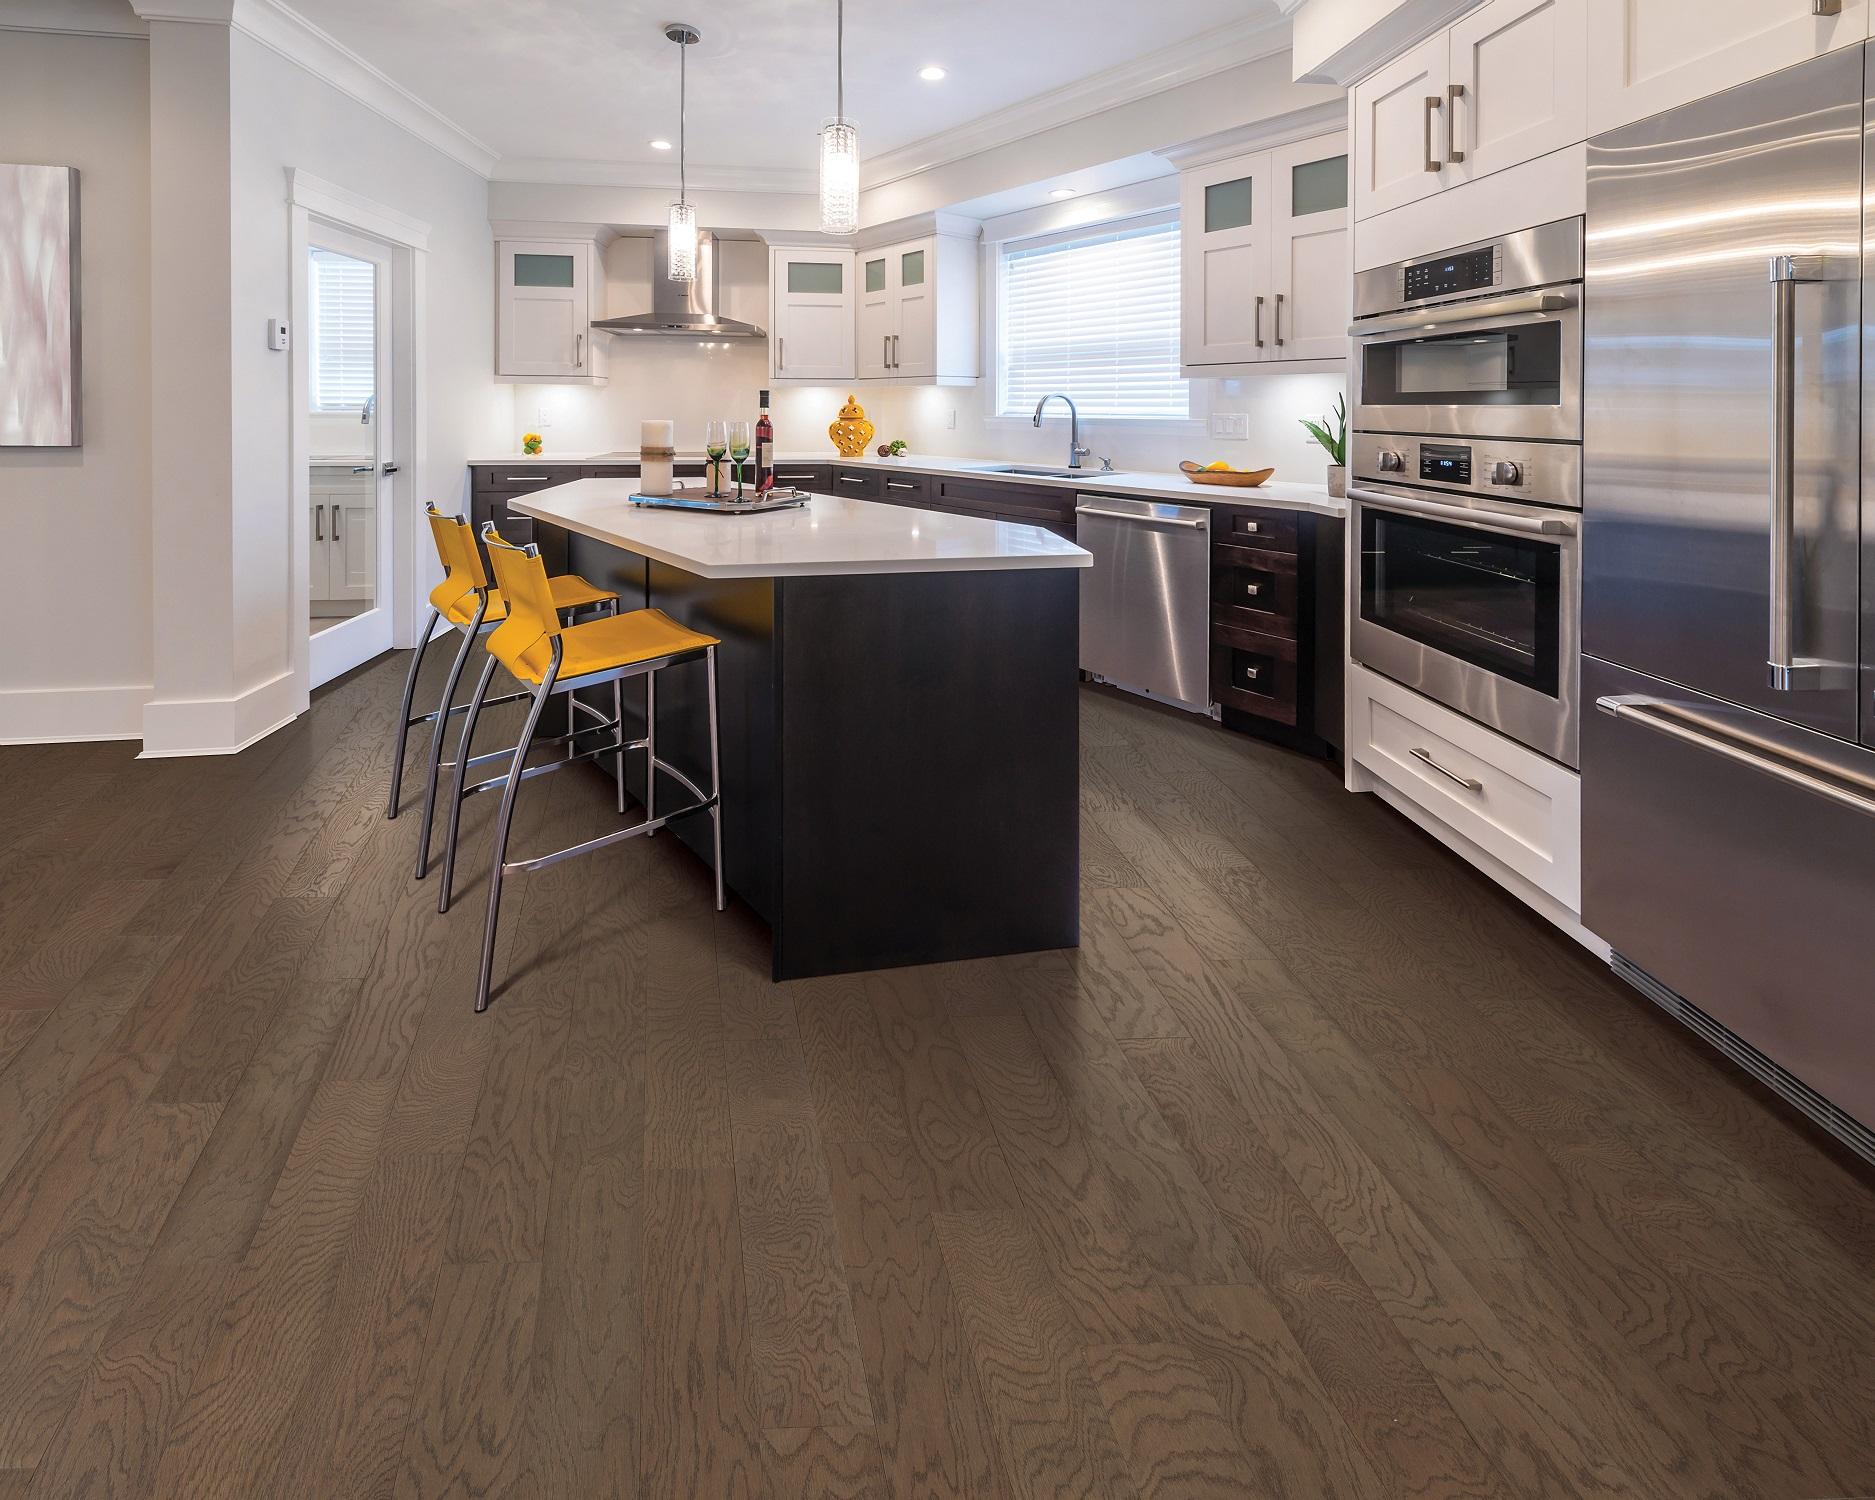 Trendy hardwood flooring in a Keller, TX kitchen